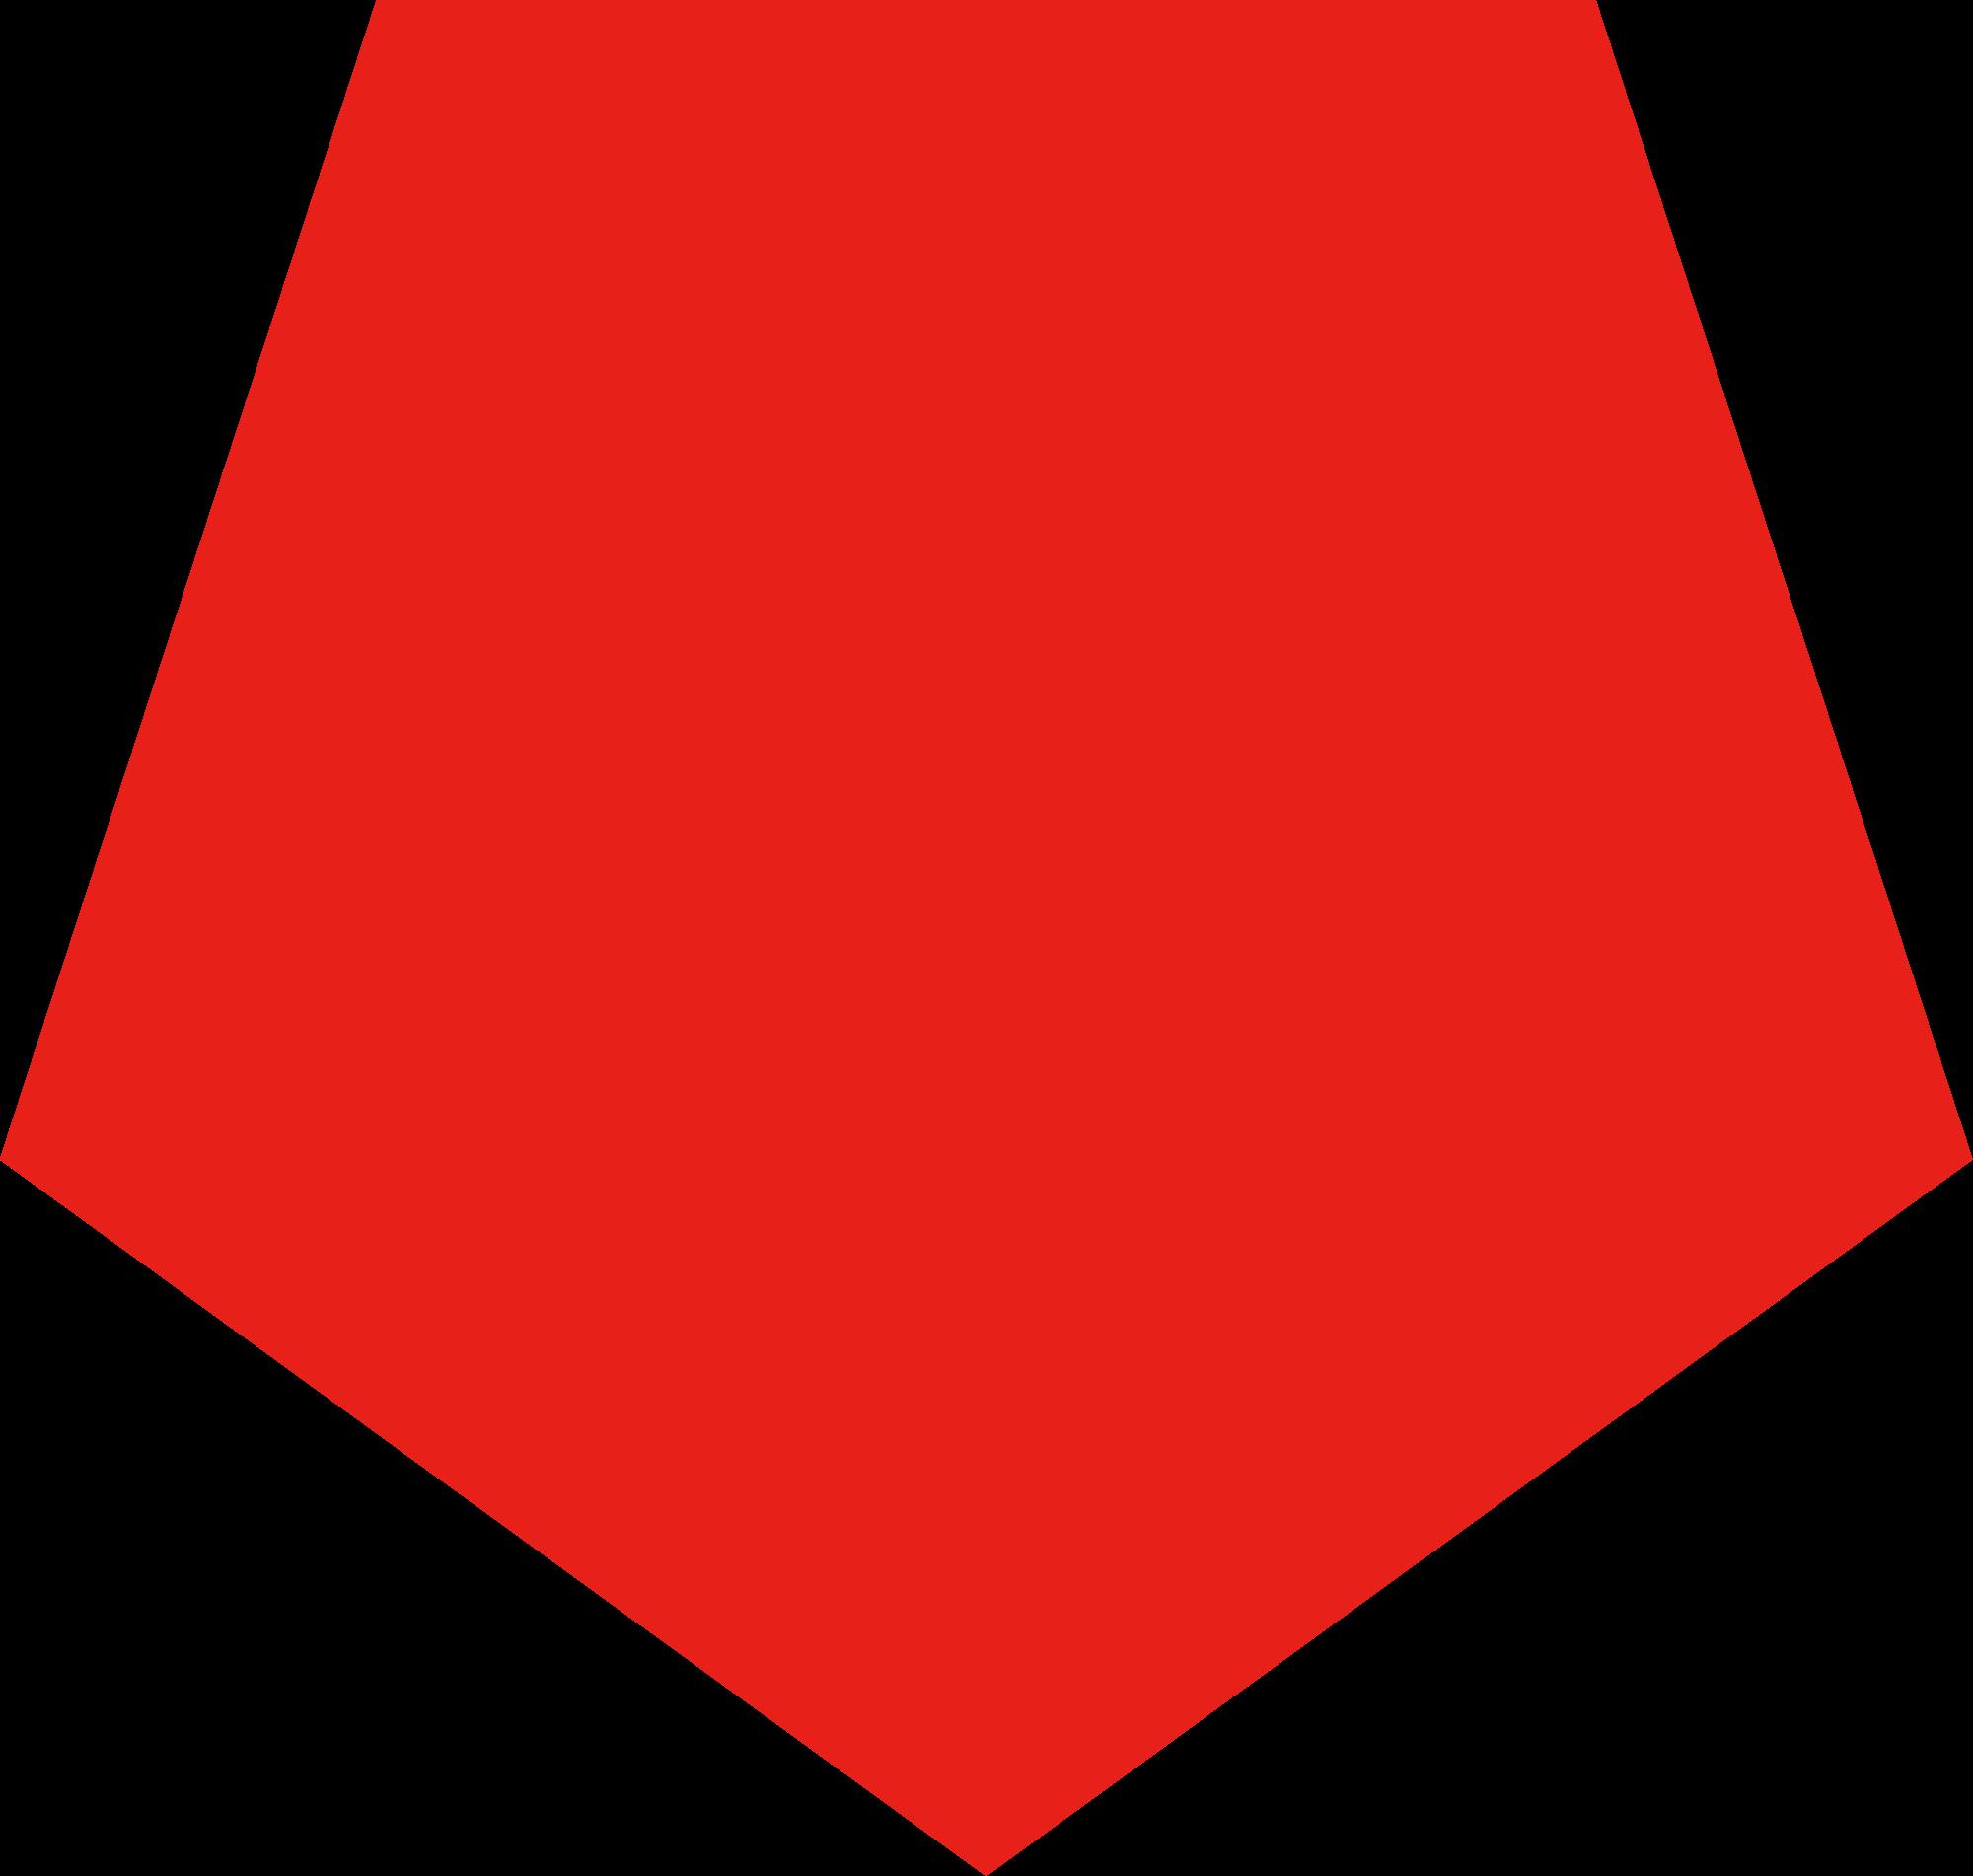 Pentagon clipart polygon Commons svg Open File:Regular Wikimedia